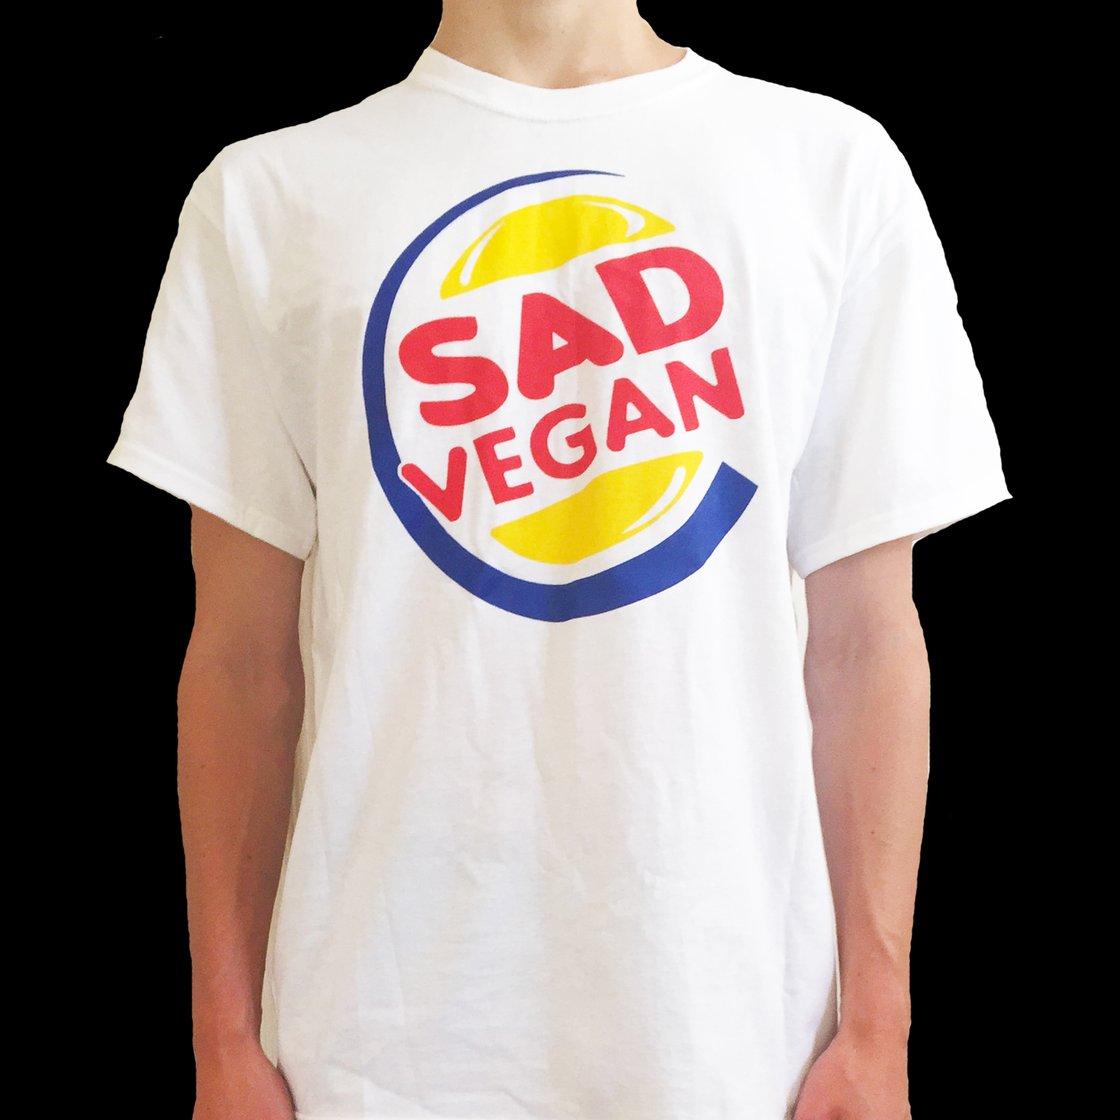 Image of Sad Vegan x Burger King Tee